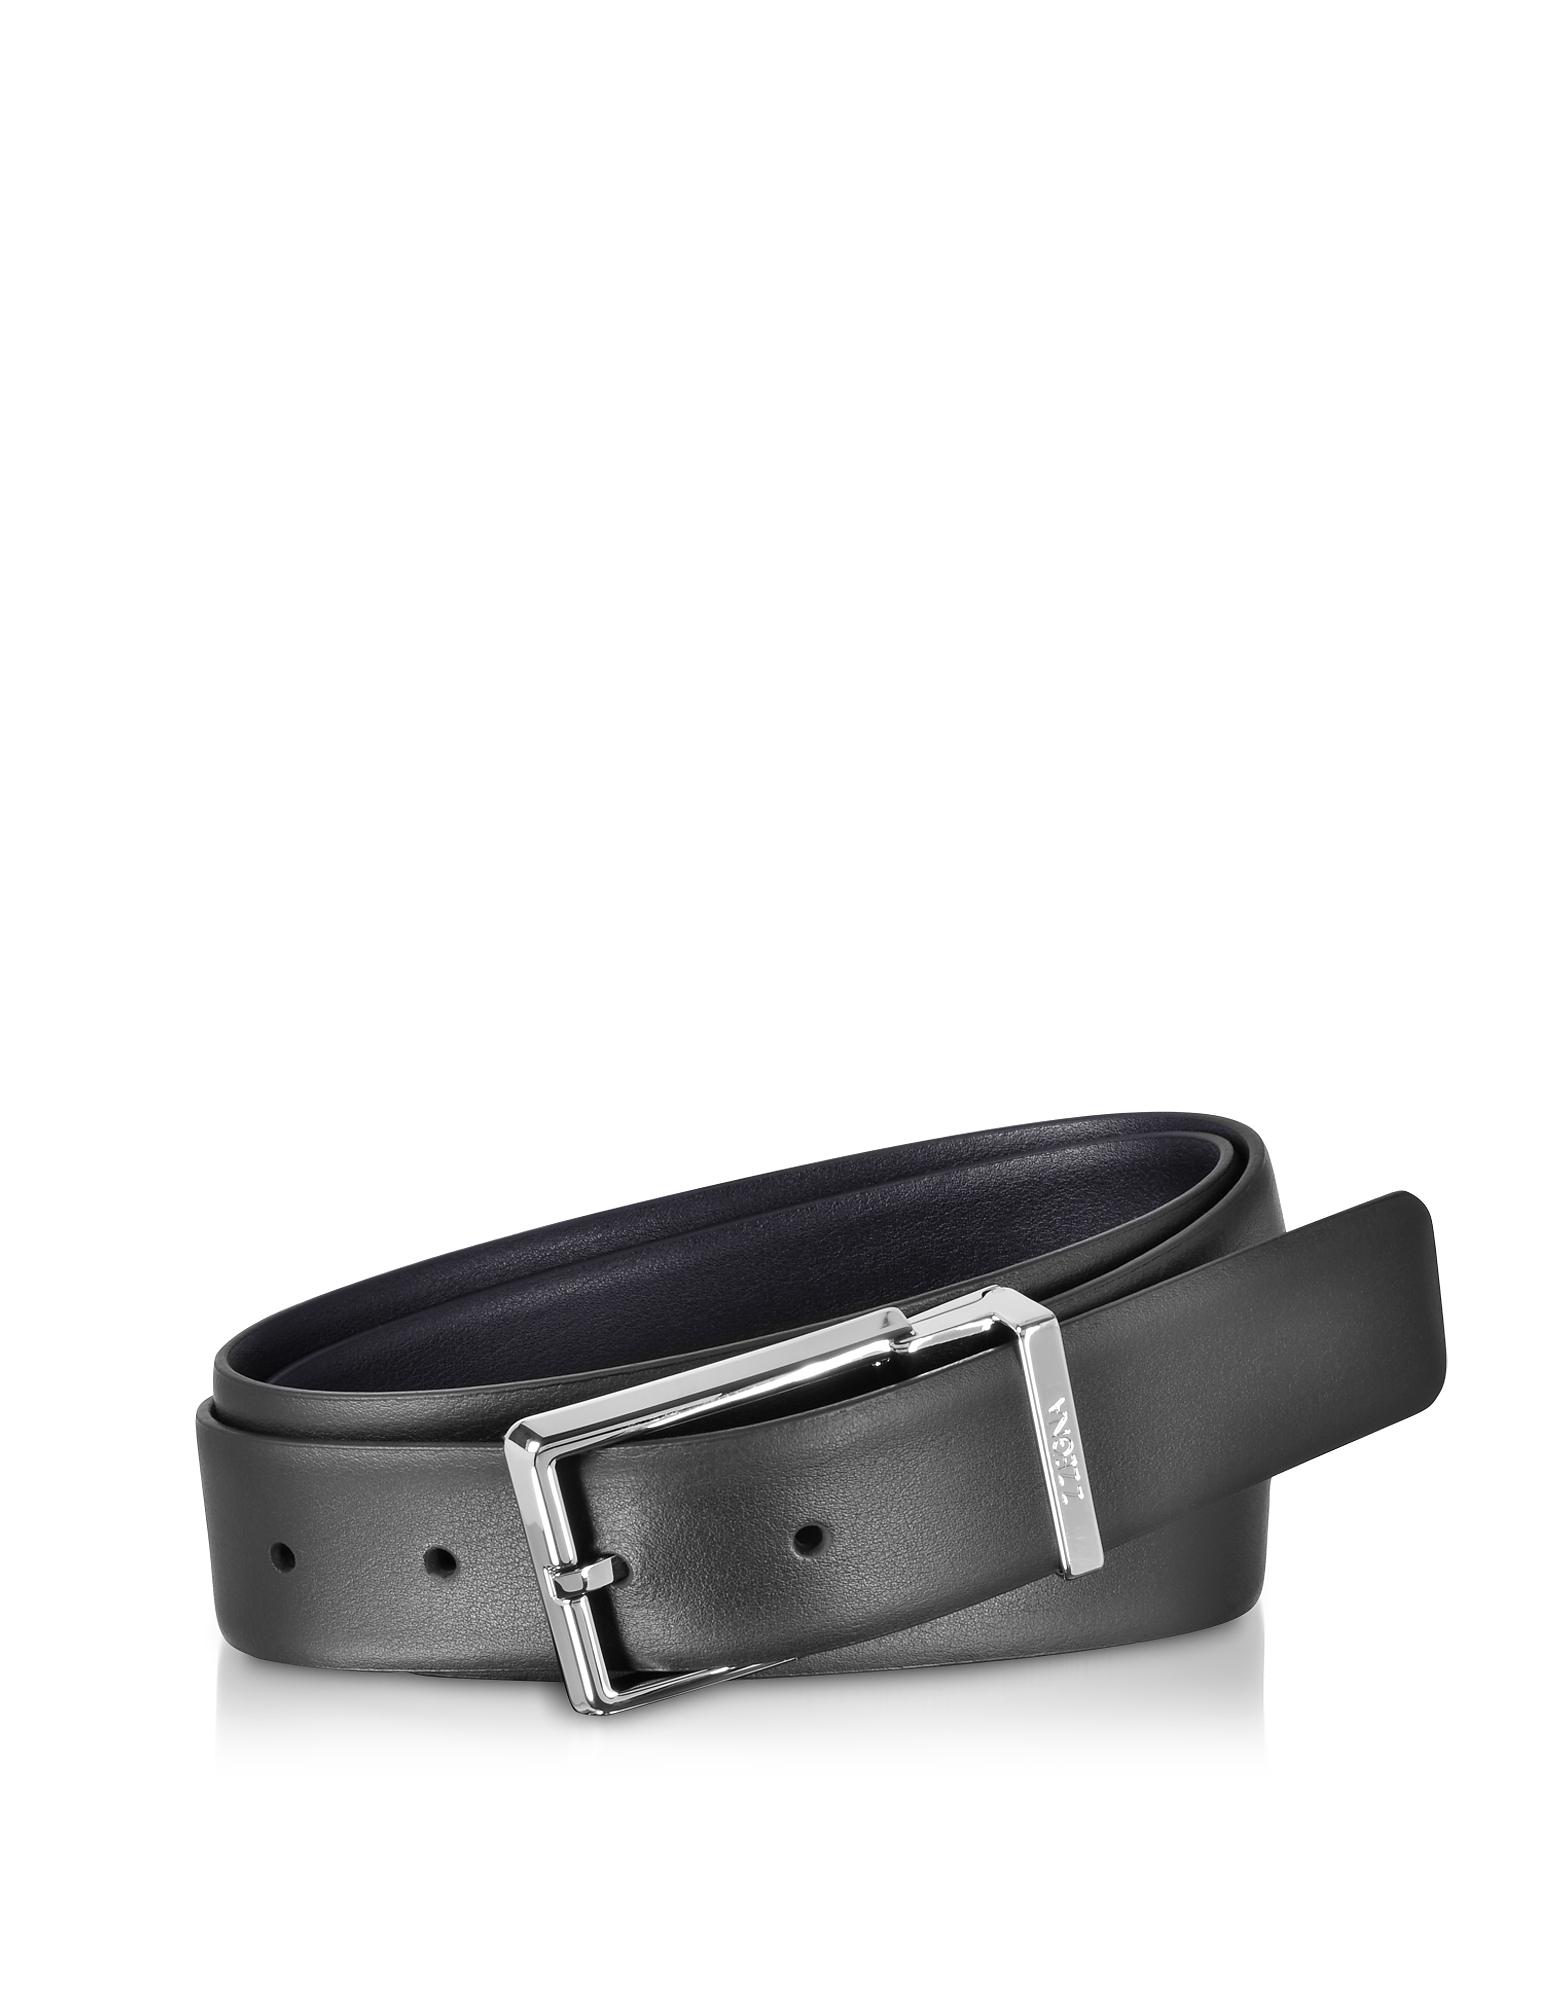 Ermenegildo Zegna Men's Belts, Two Tone Leather Adjustable and Reversible Men's Belt